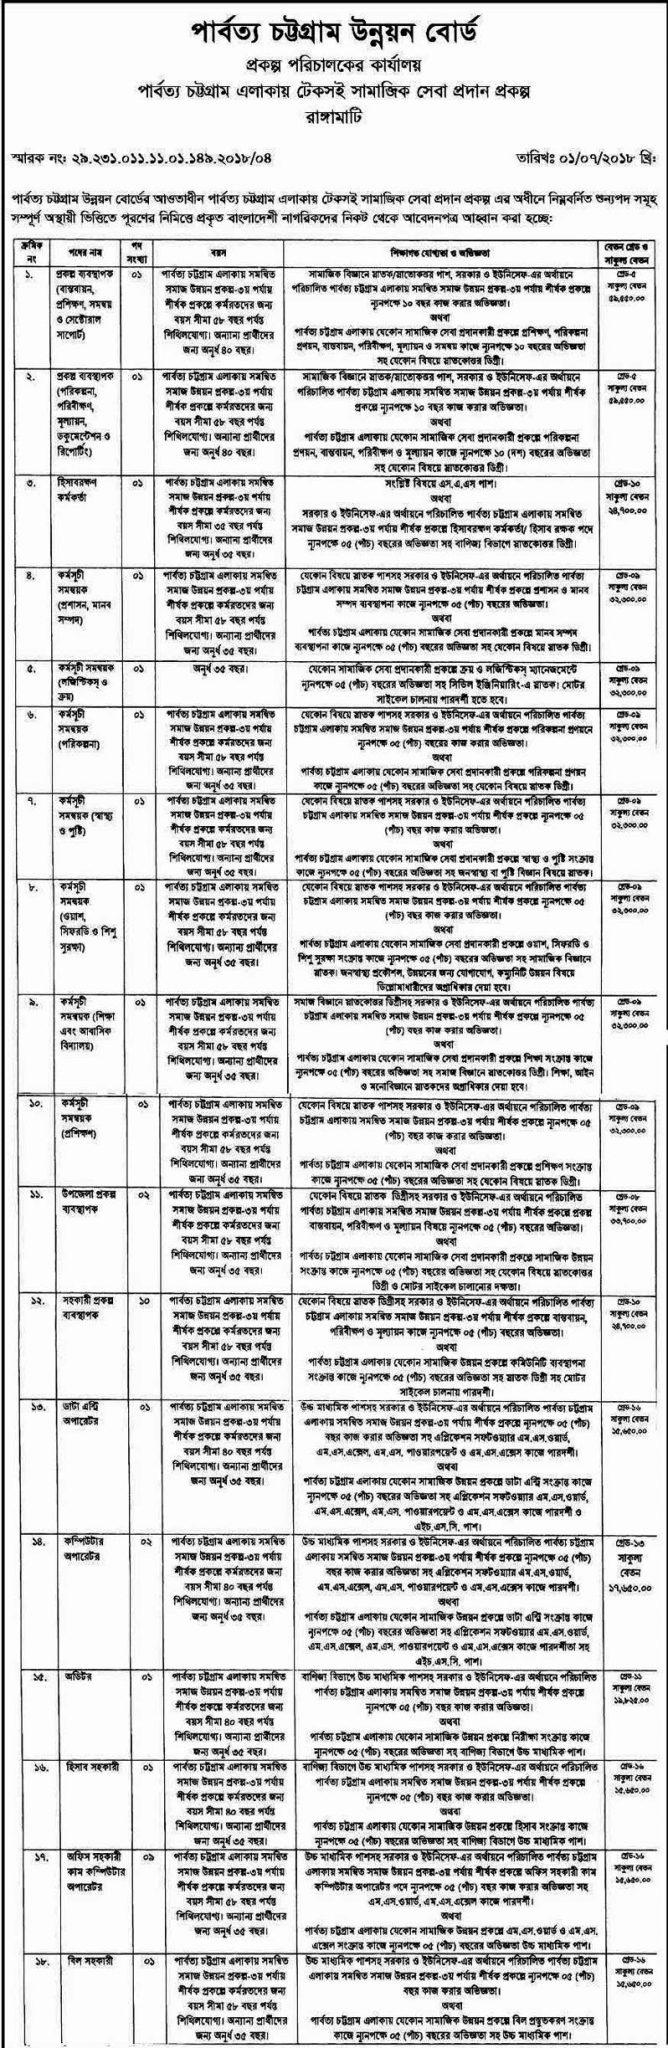 Chittagong Hill Tracts Development Board Job Circular 2018